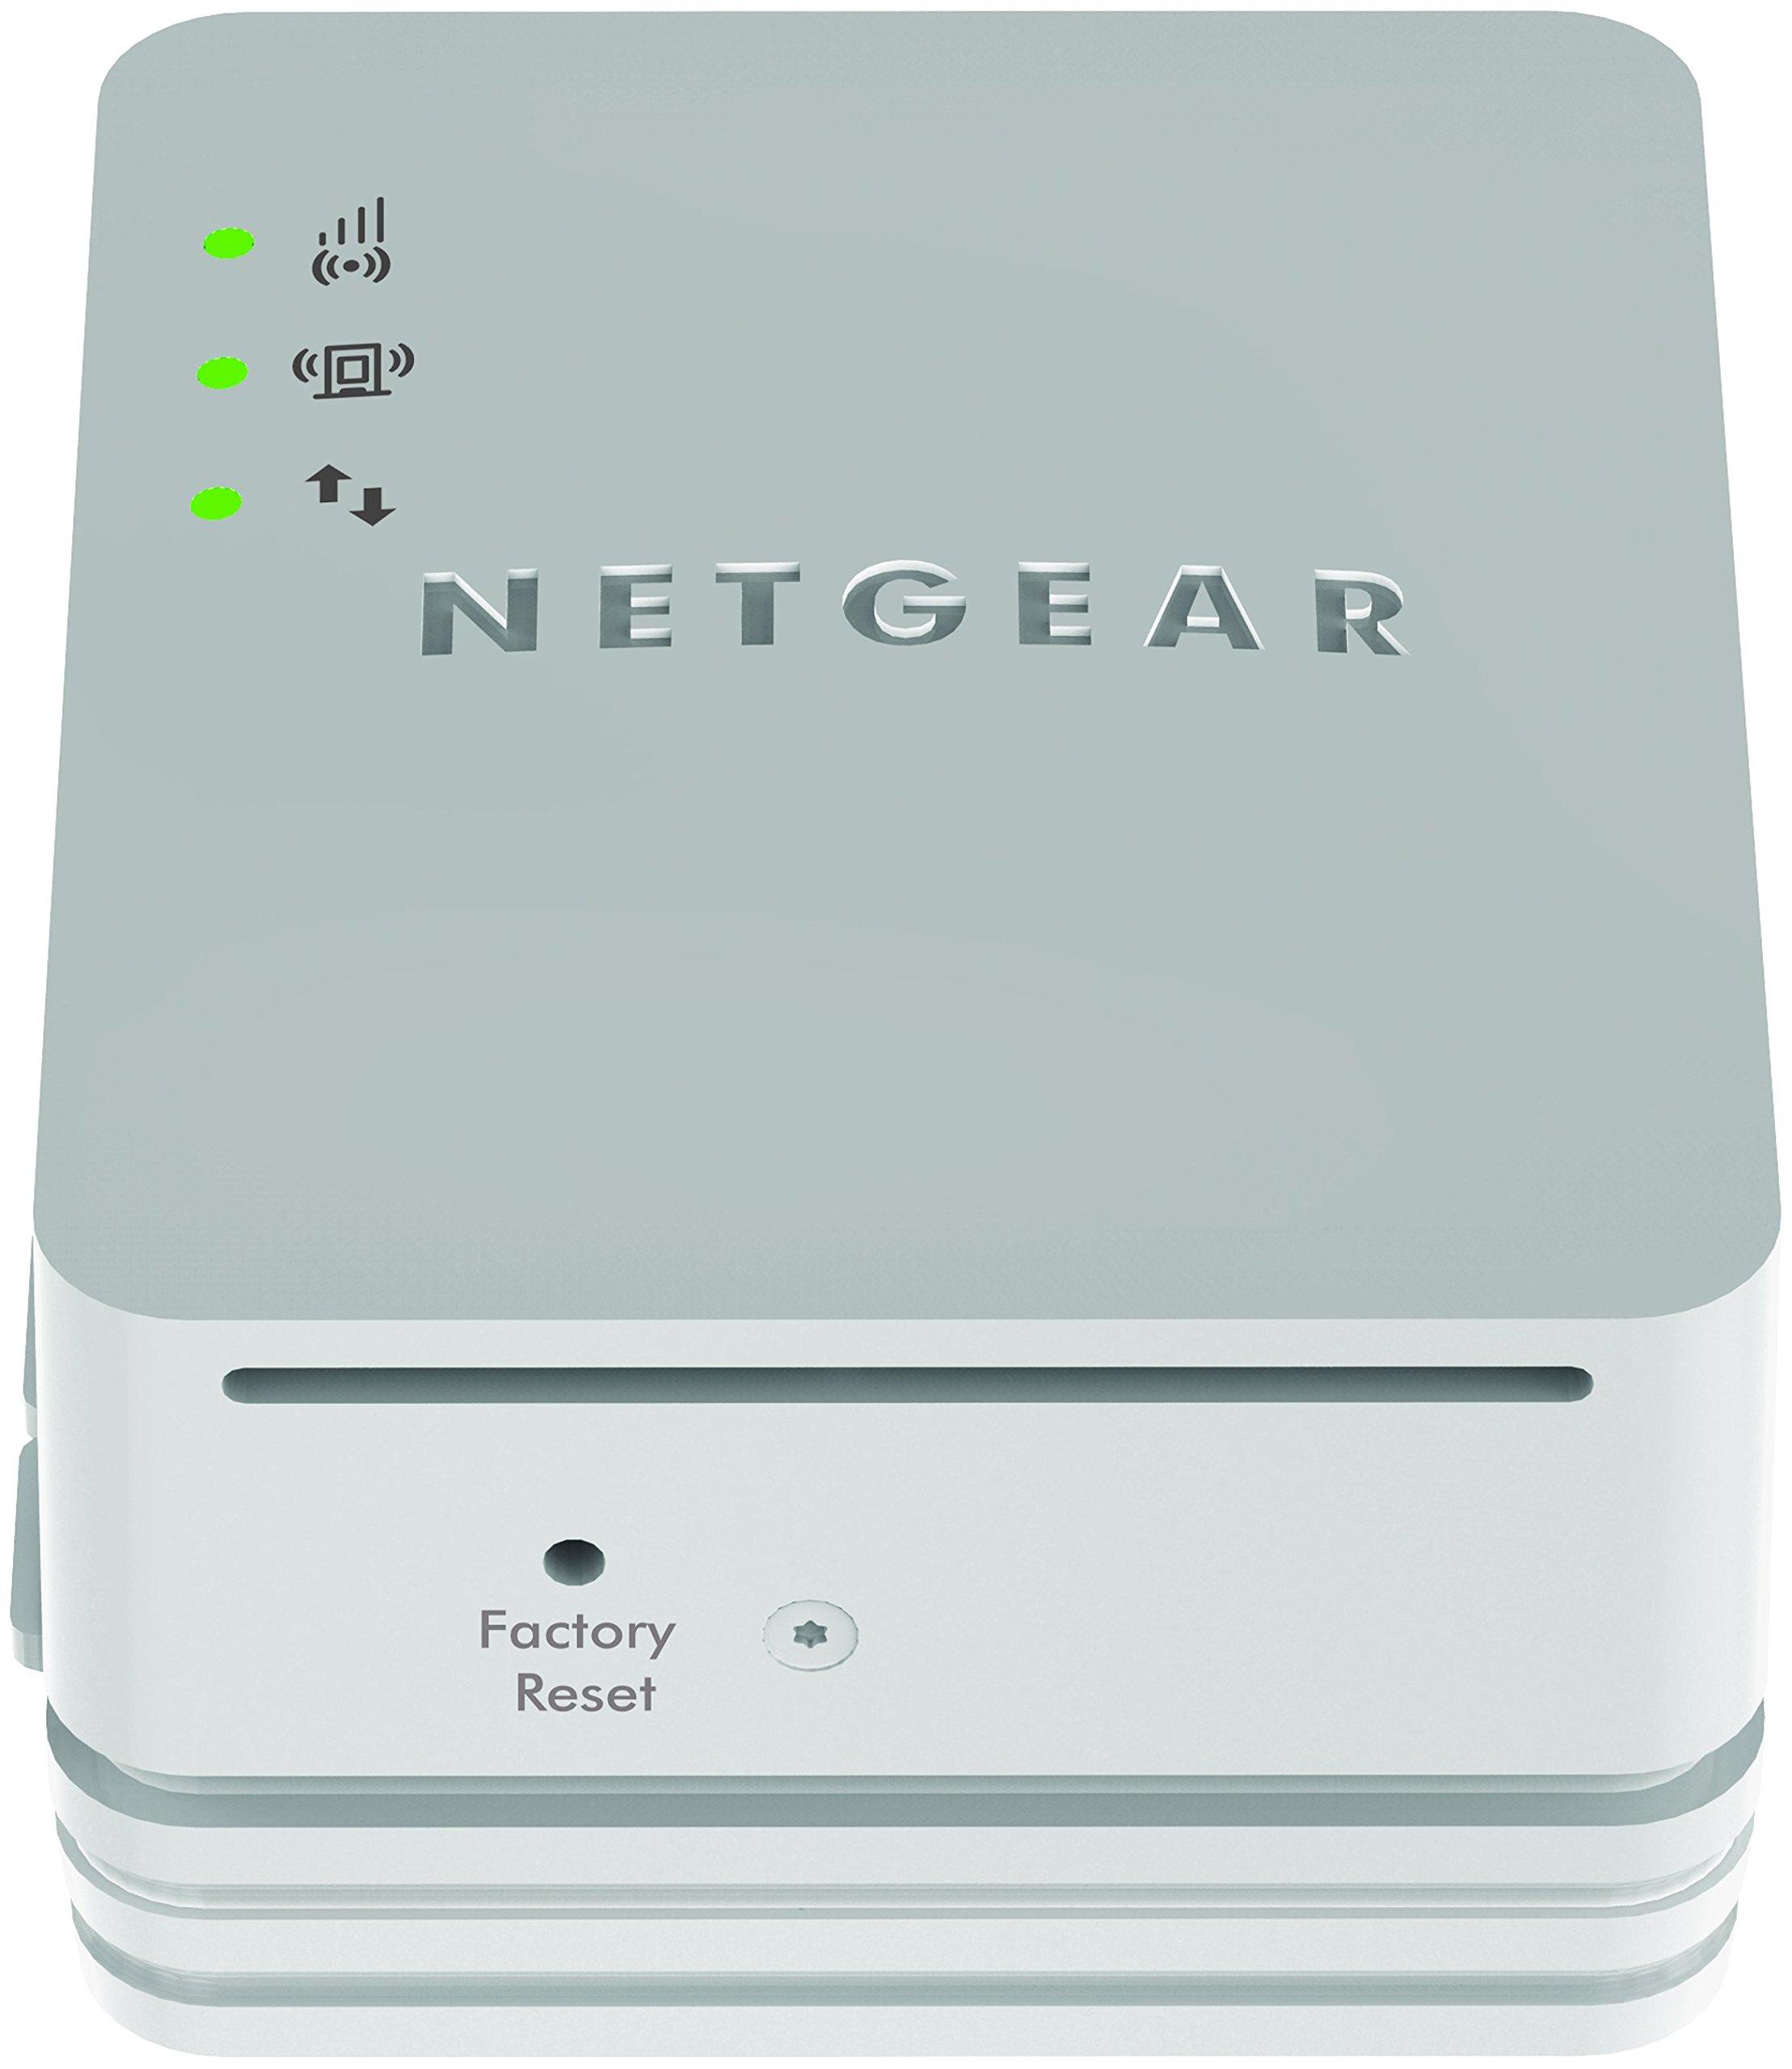 NETGEAR N150 Wi-Fi Range Extender for Mobile - Wall Plug Version (WN1000RP) by NETGEAR (Image #4)